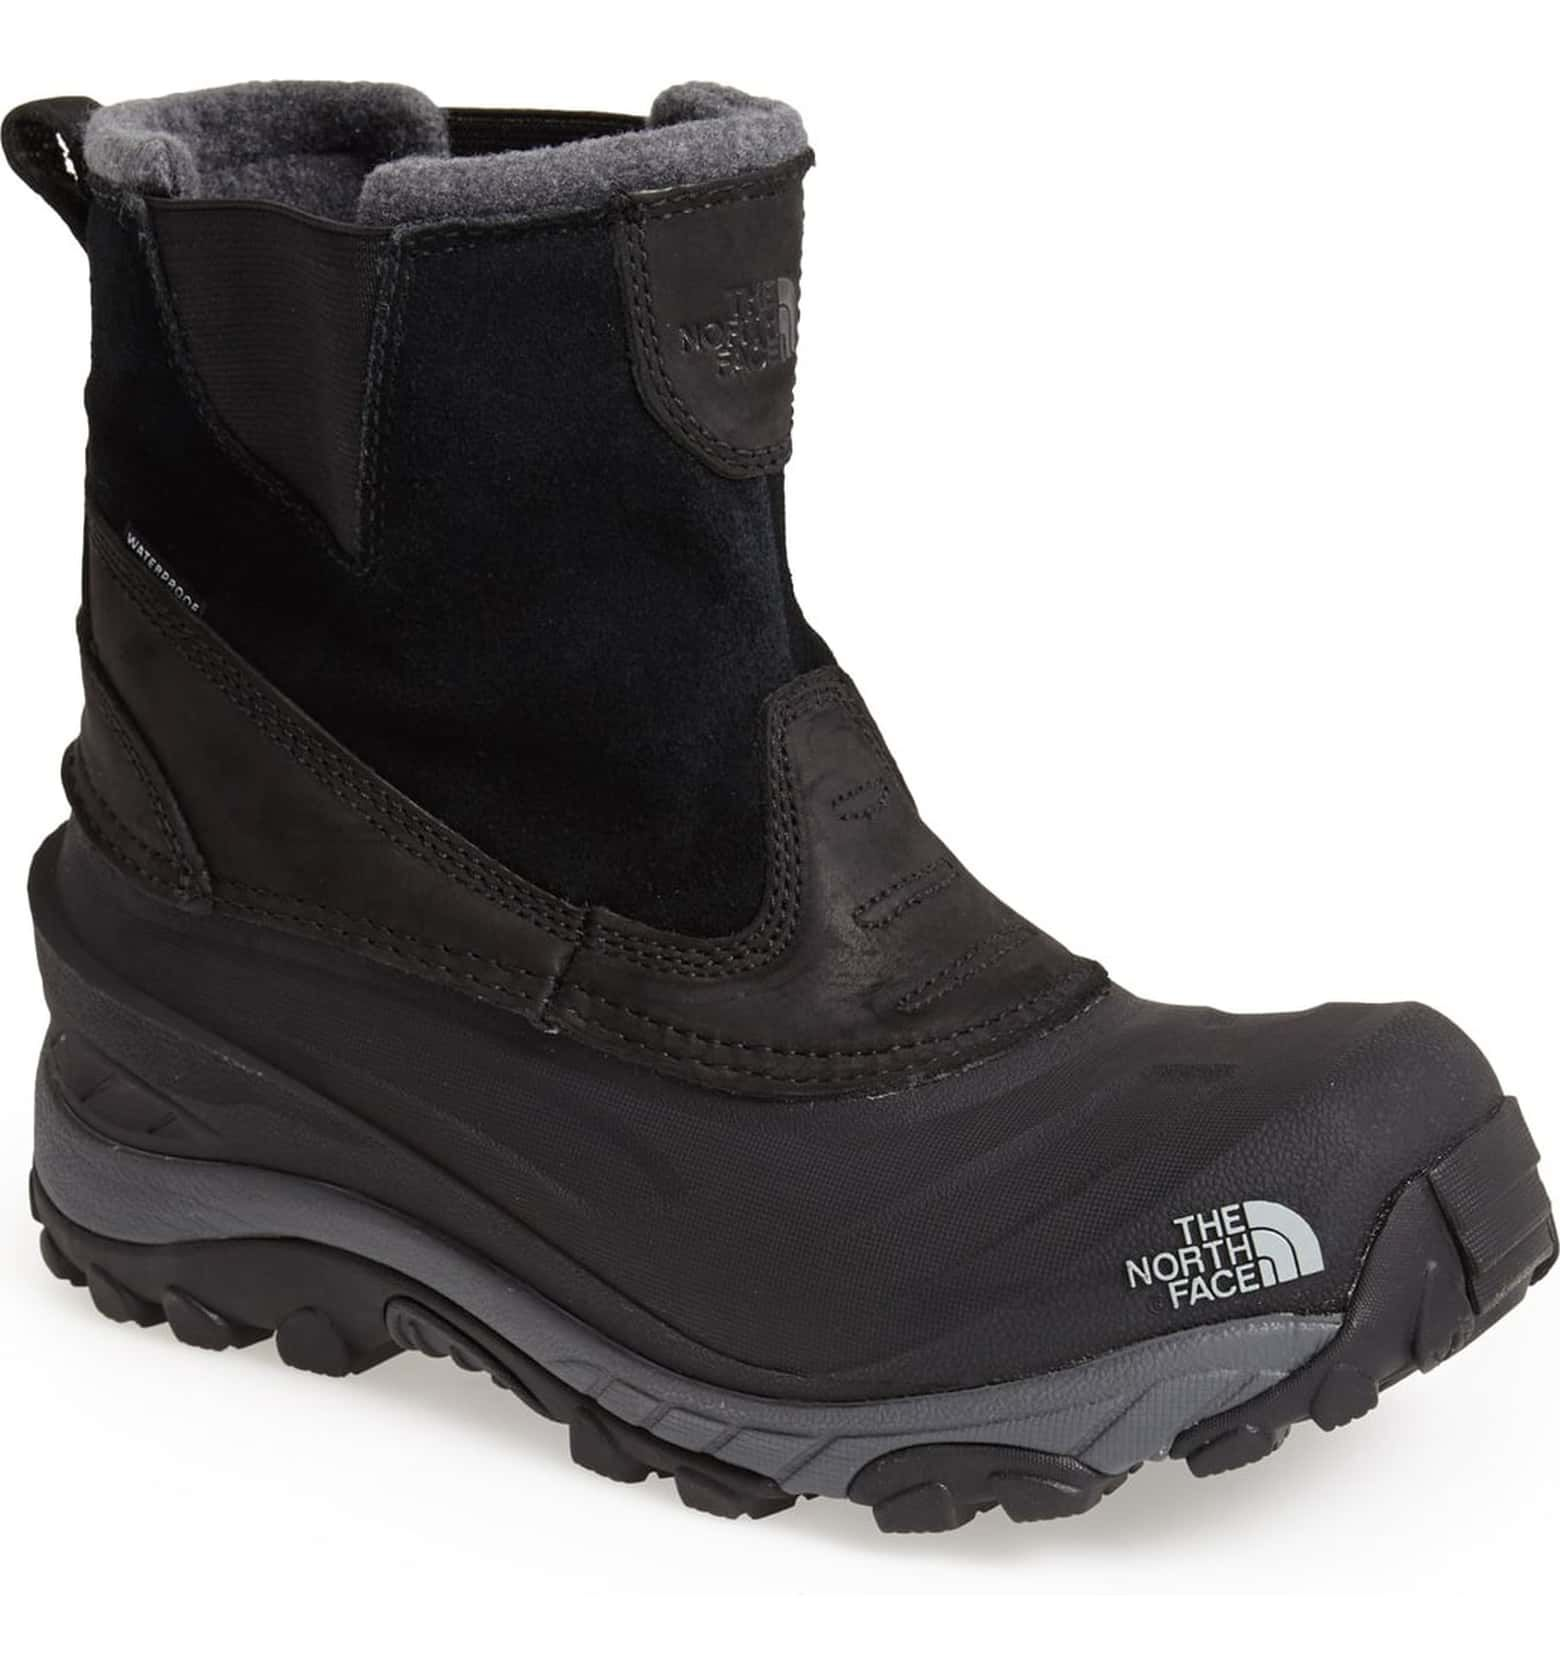 Chilkat II Waterproof Snow Boot, Main